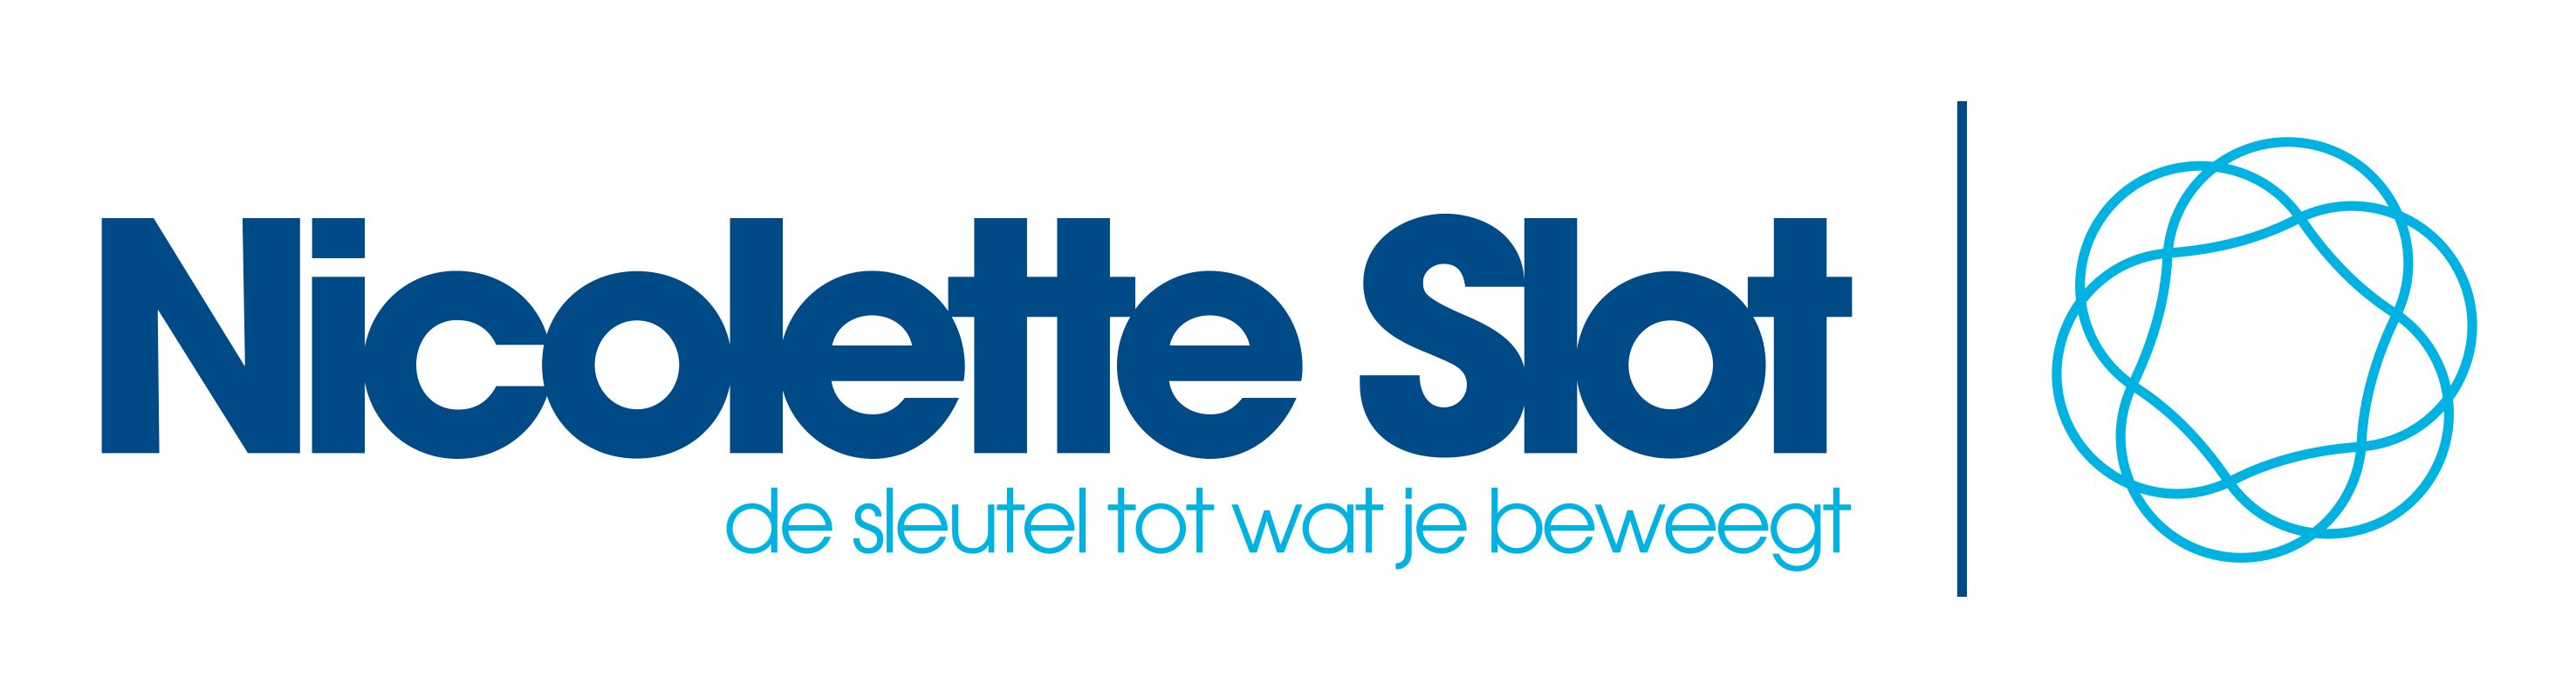 NIcolette Slot